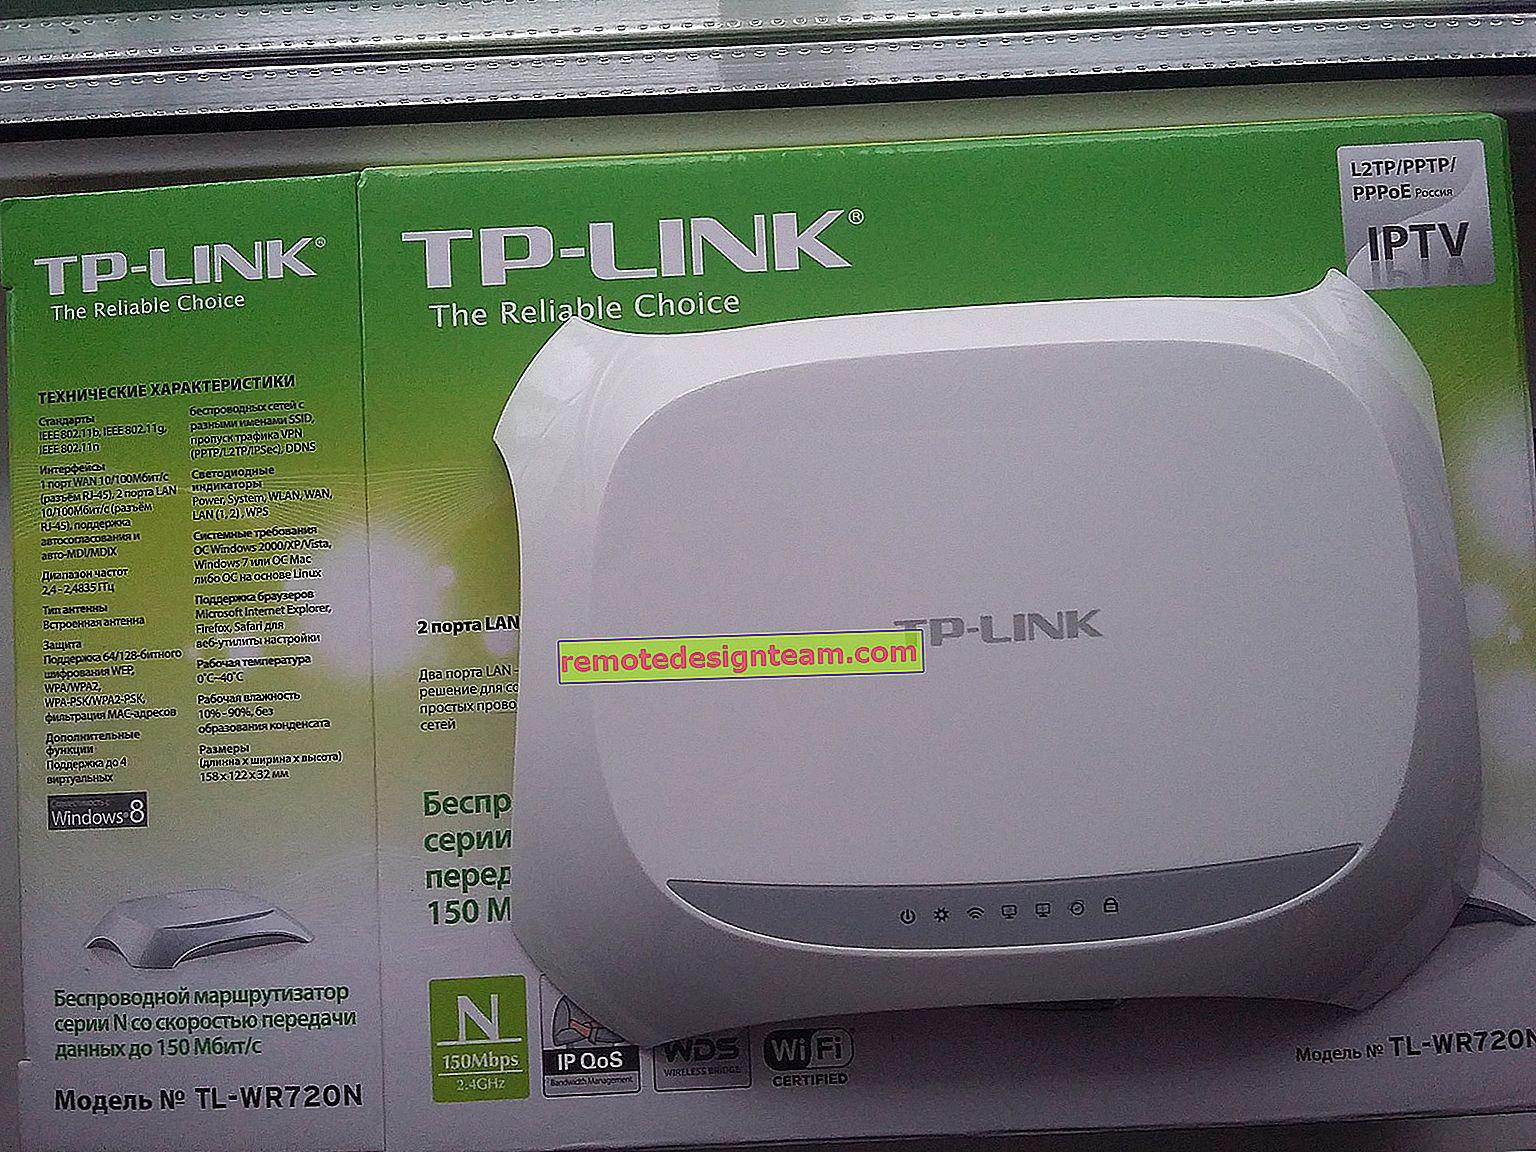 Router TP-LINK TL-WR720N zmniejsza prędkość